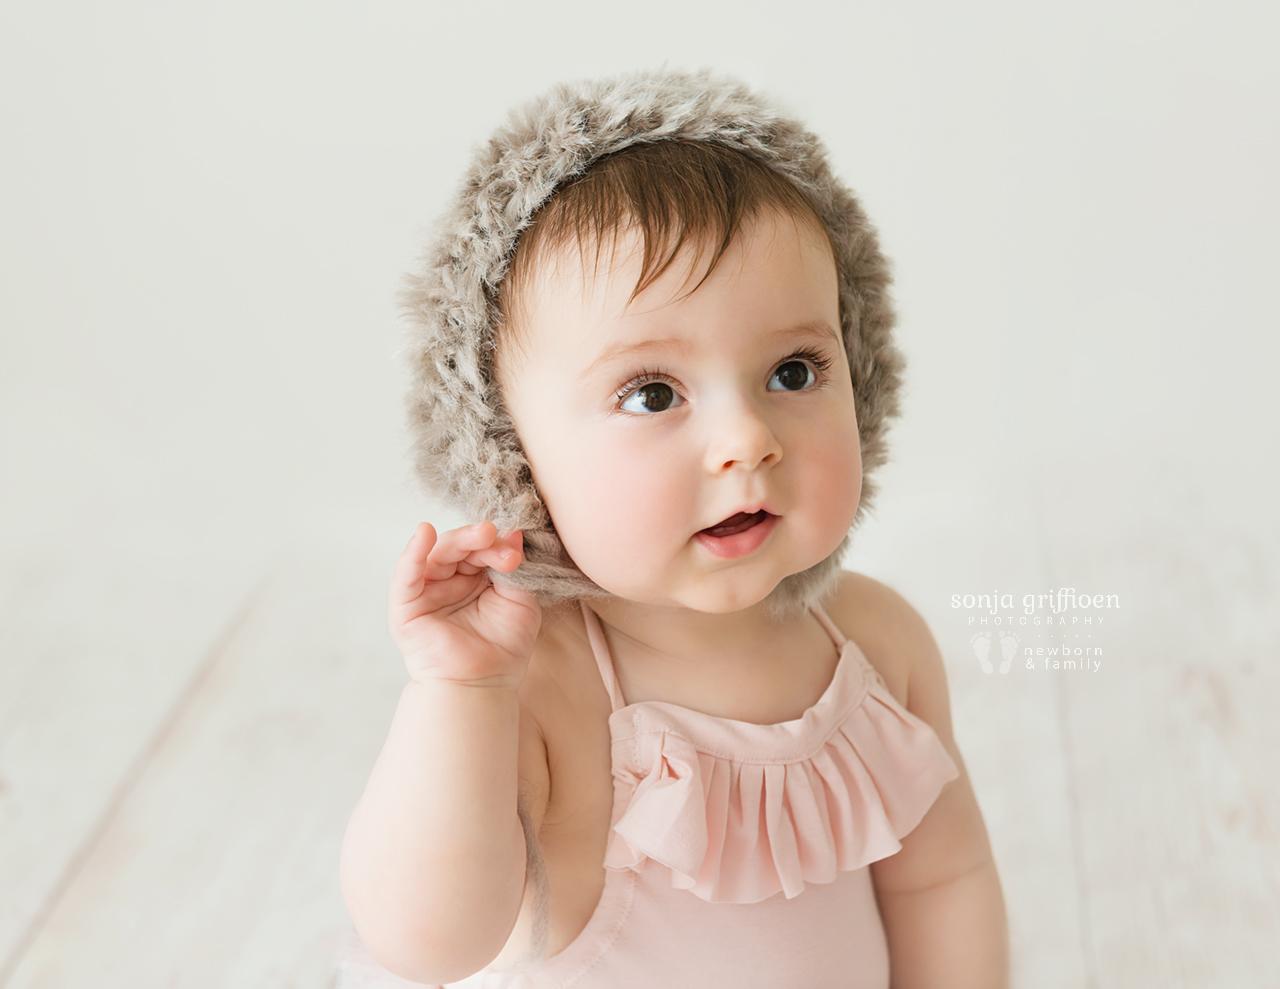 Annabella-Milestone-Brisbane-Baby-Photographer-Sonja-Griffioen-03.jpg